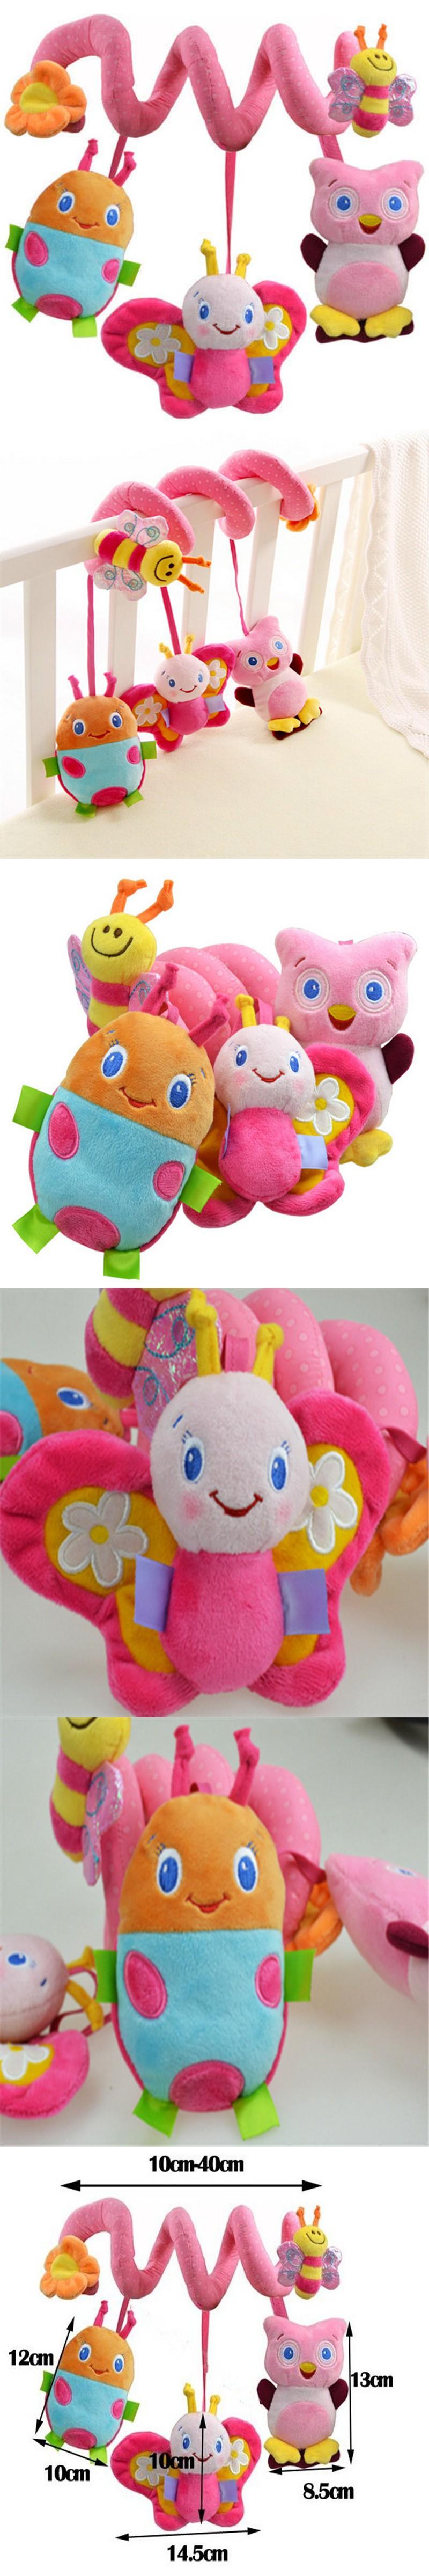 Car hanging toys  Soft Musical Animal Bee Pink Hanging Toys Plush Crib Bed Car Hanging